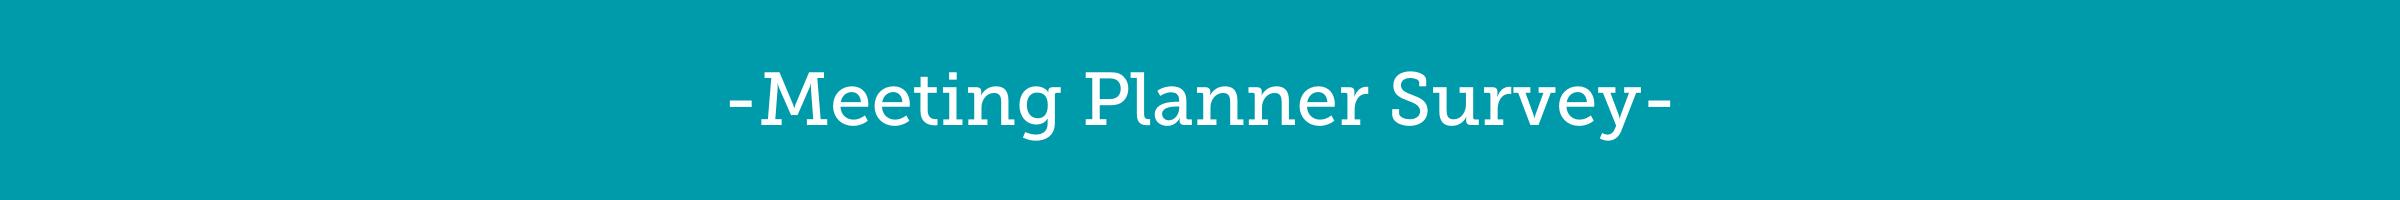 Meeting Planner Survey